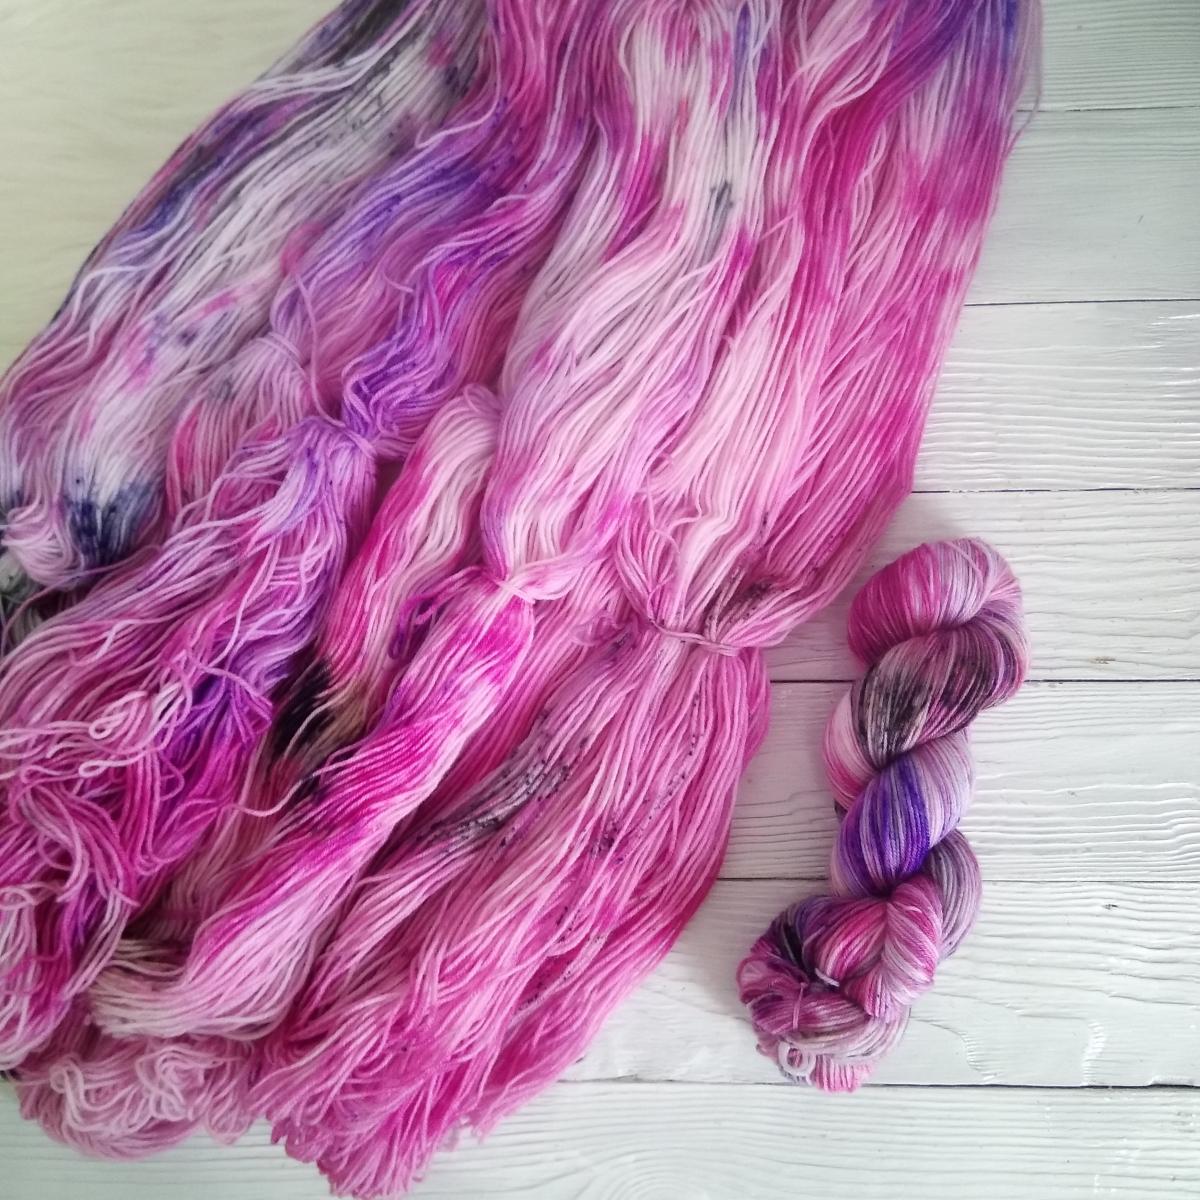 woodico.pro hand dyed yarn 041 1200x1200 - Hand dyed yarn / 041